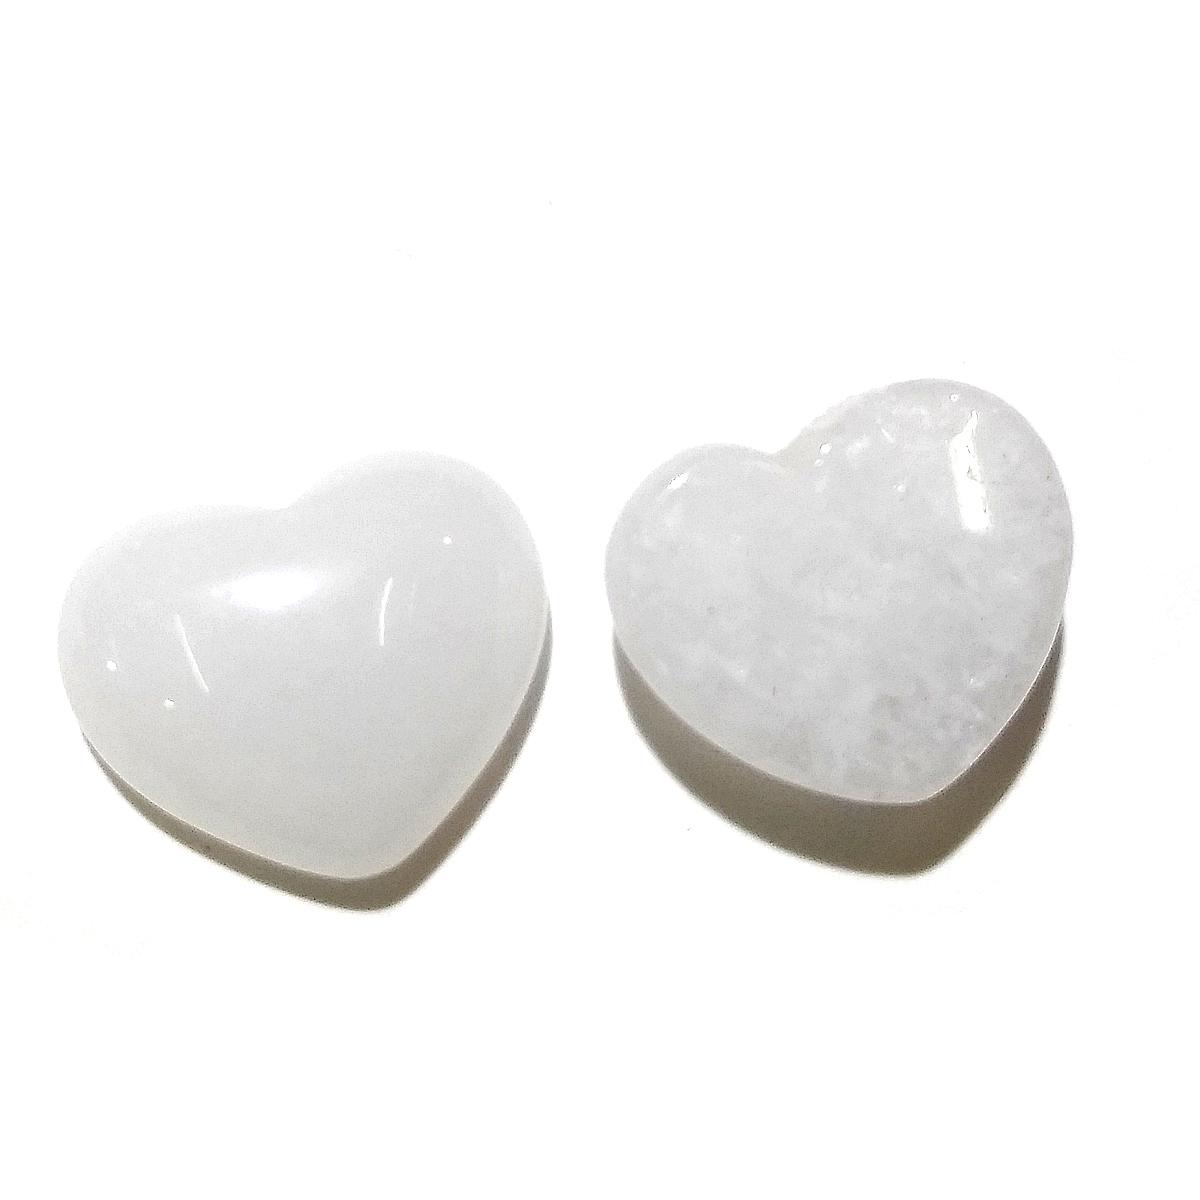 HA14260 - Charming Beads Pacco 10 x Bianco Acrilico 25mm Bottoni Tondi 2 Fori